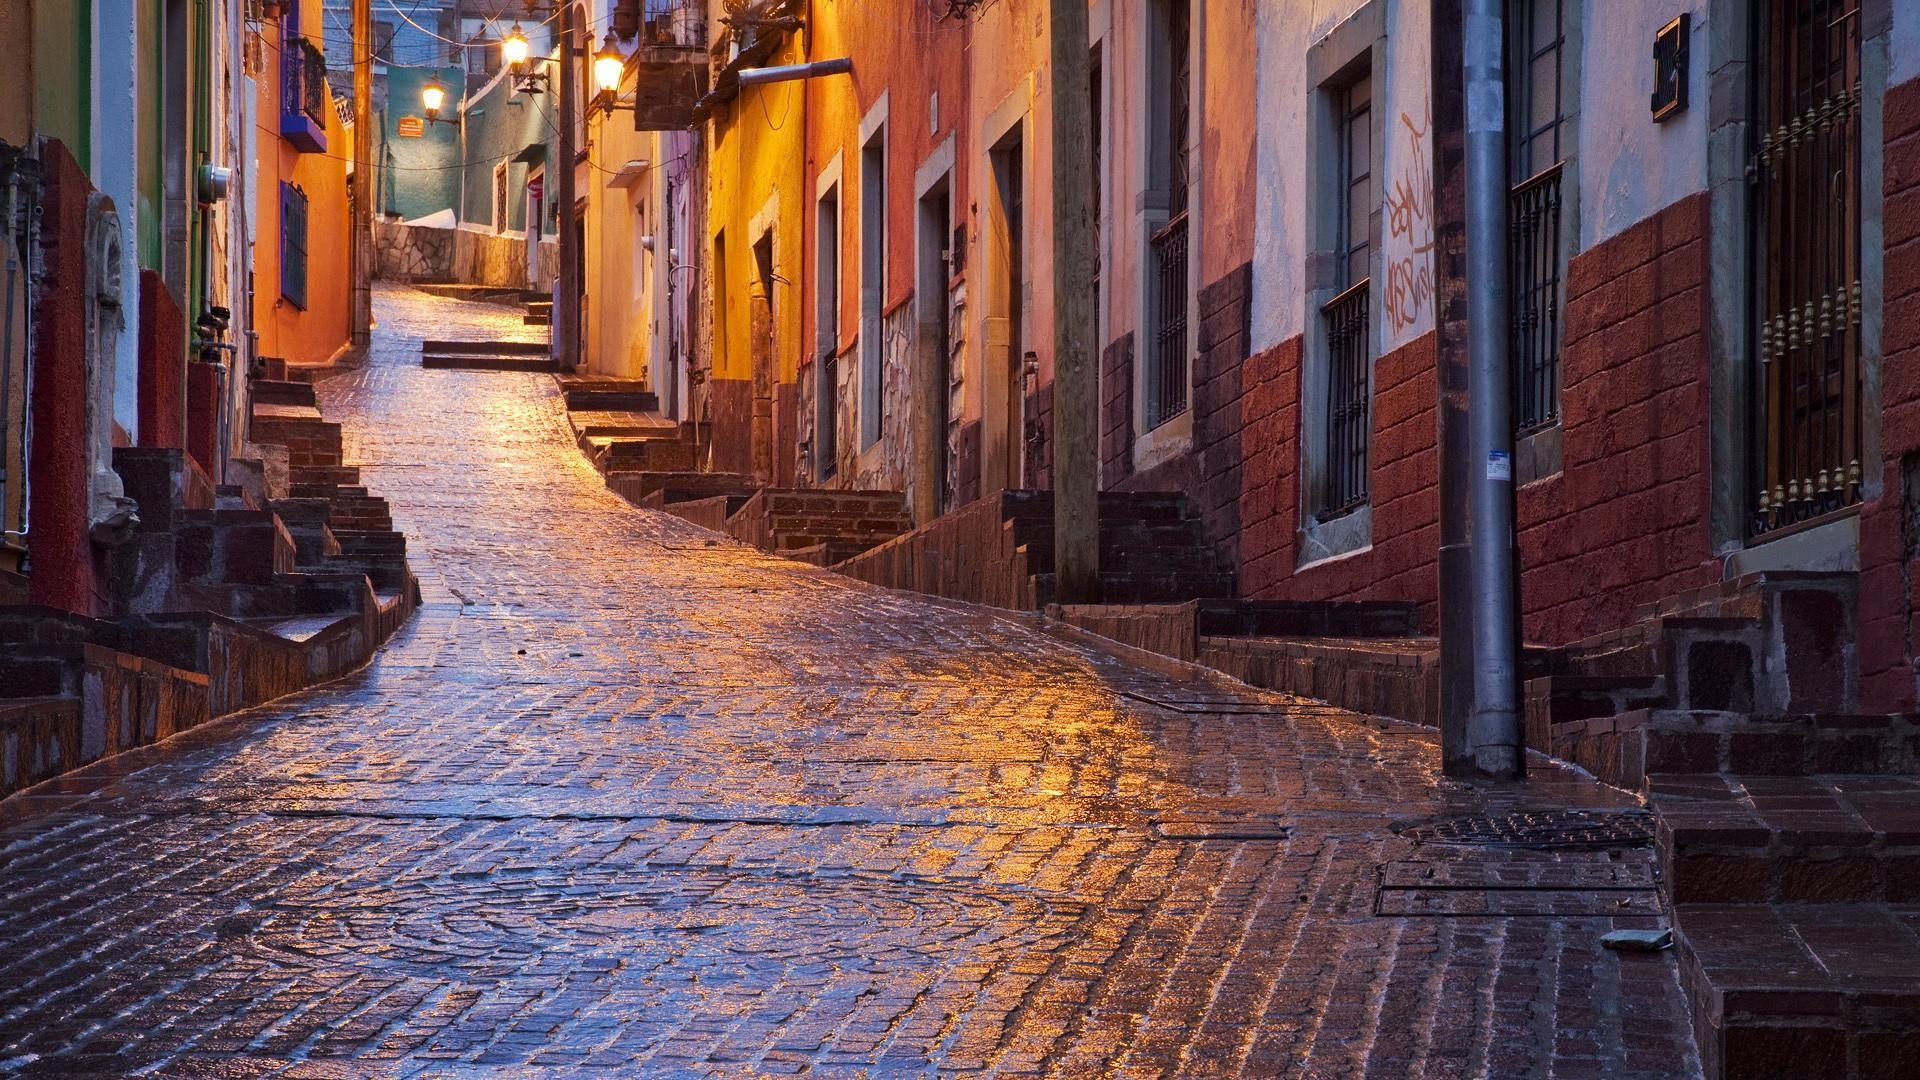 An Uphill Alley Wet After Rain Wallpaper Mexico Wallpaper Guanajuato City Wallpaper